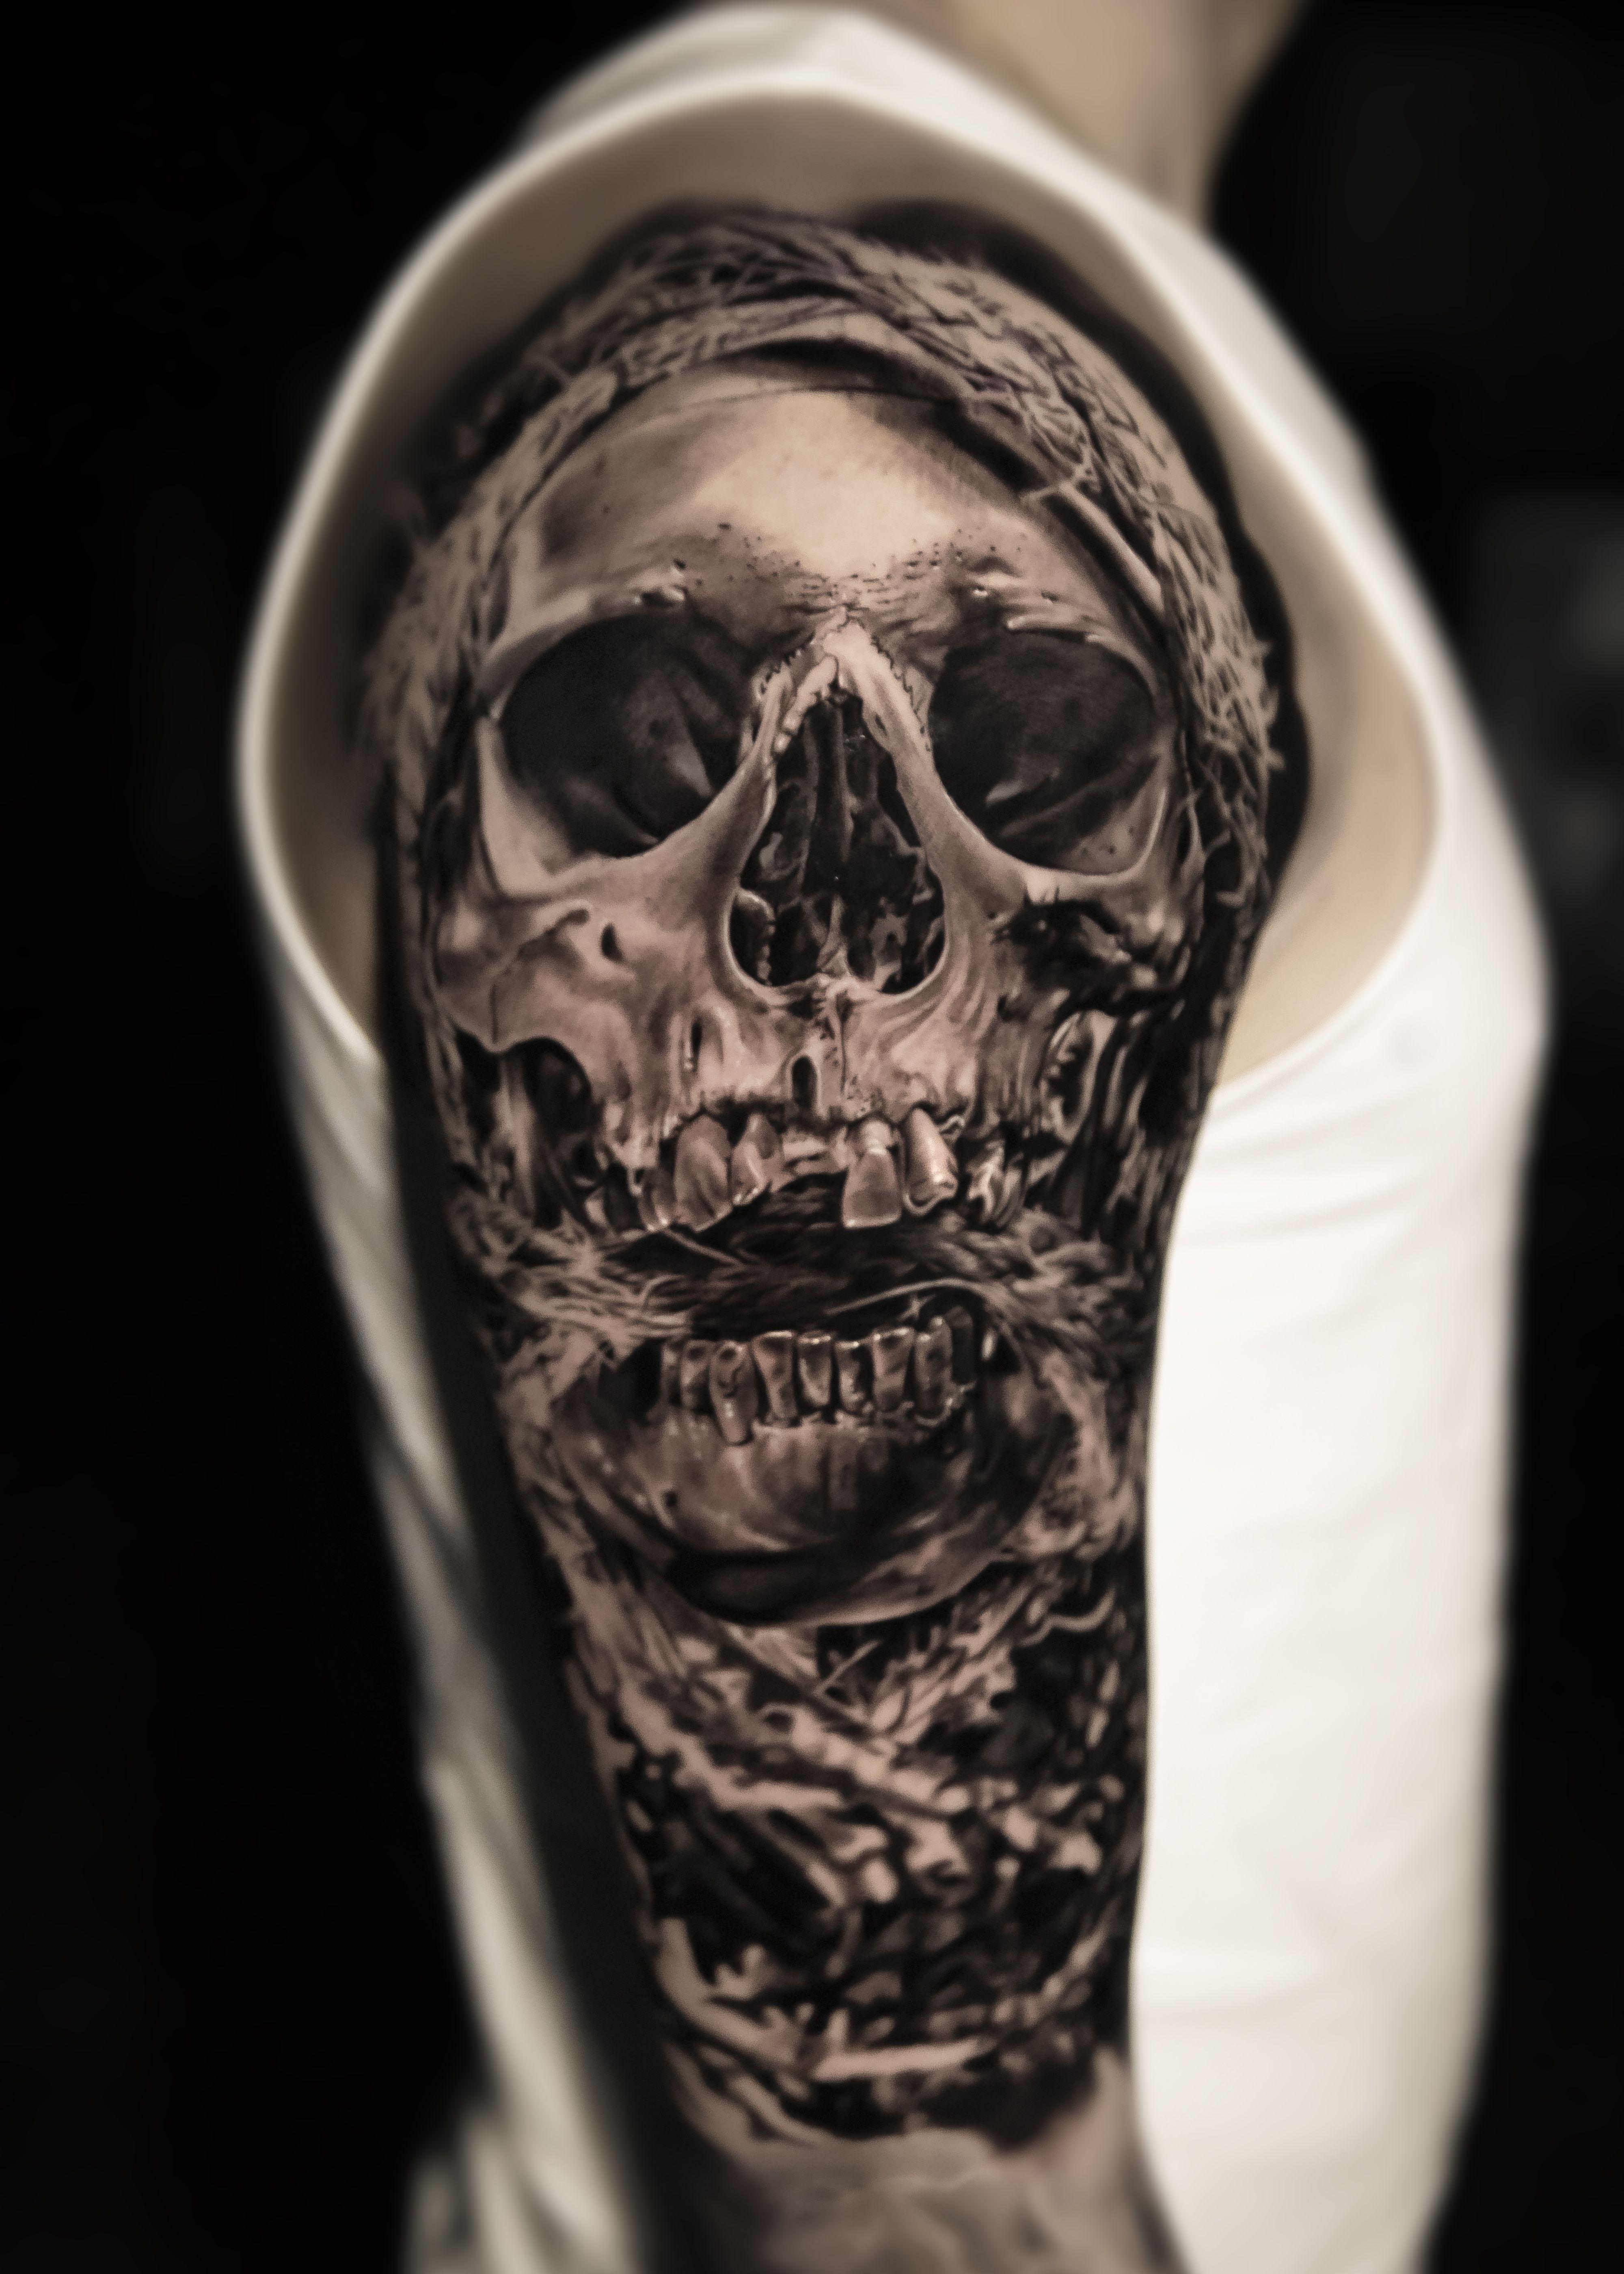 Realistic Skull Tattoo In 2020 Skull Tattoo Tattoos Skull